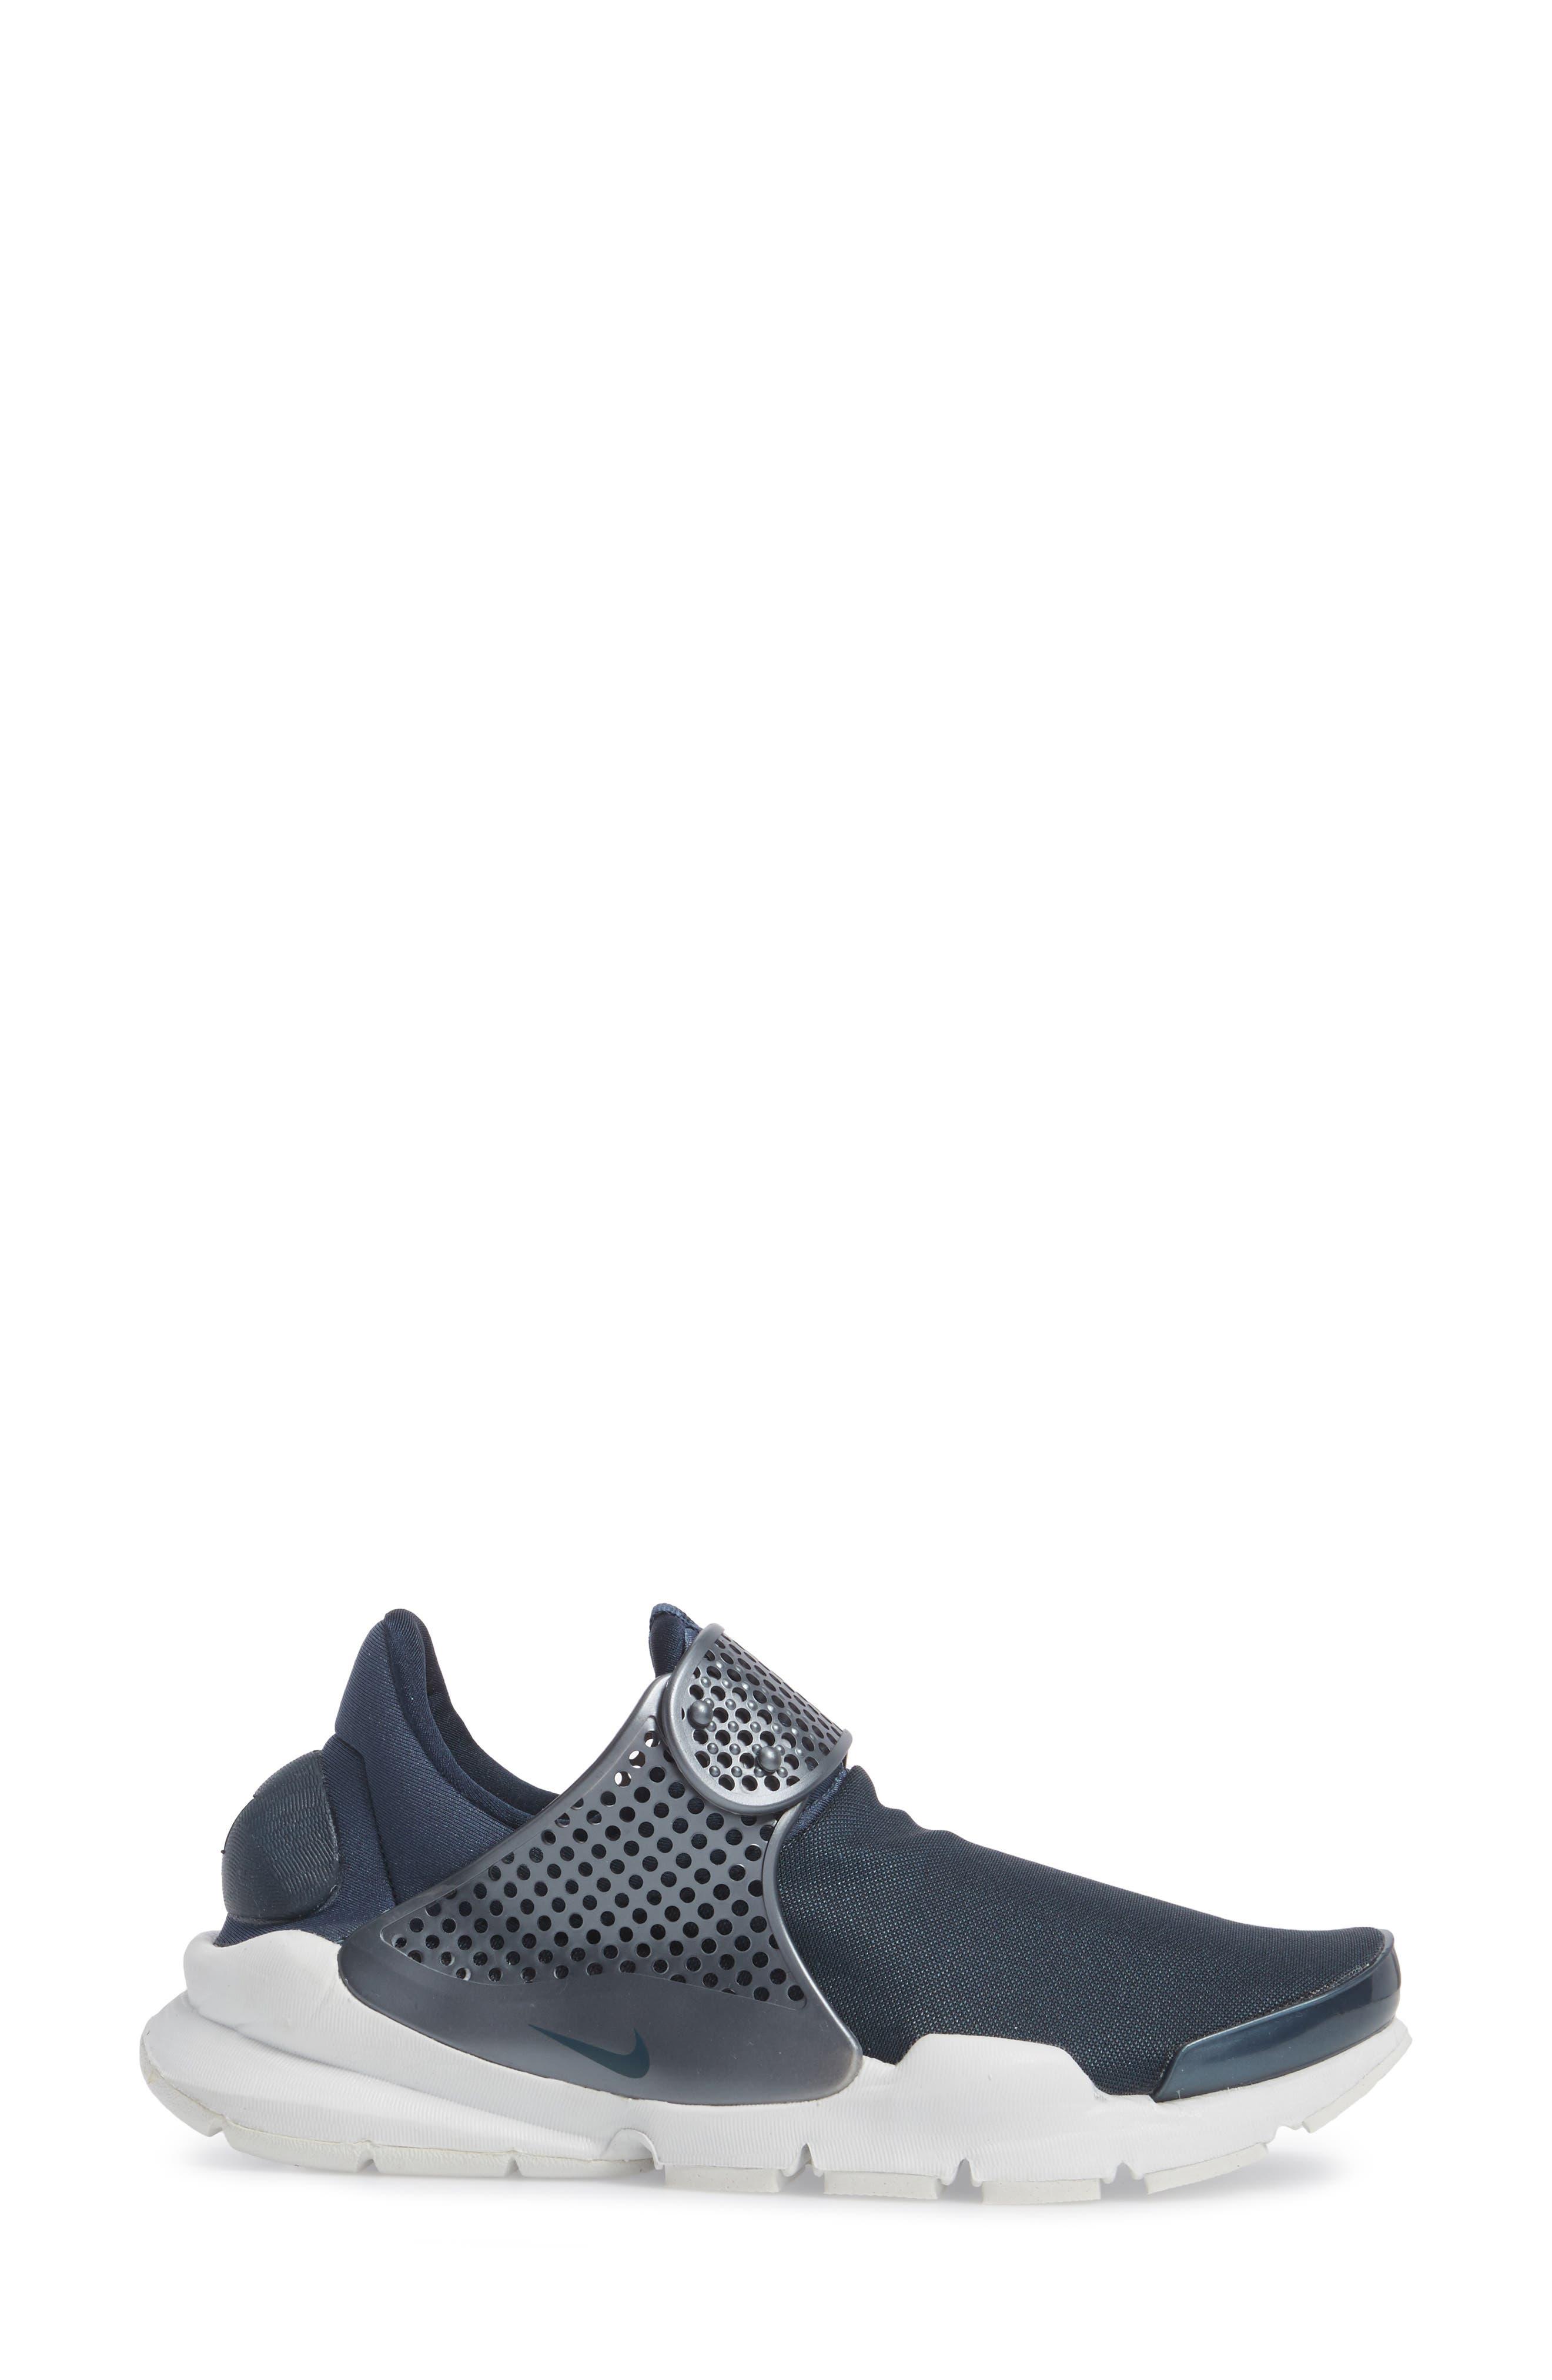 Sock Dart Sneaker,                             Alternate thumbnail 3, color,                             Metallic/ Armory Navy